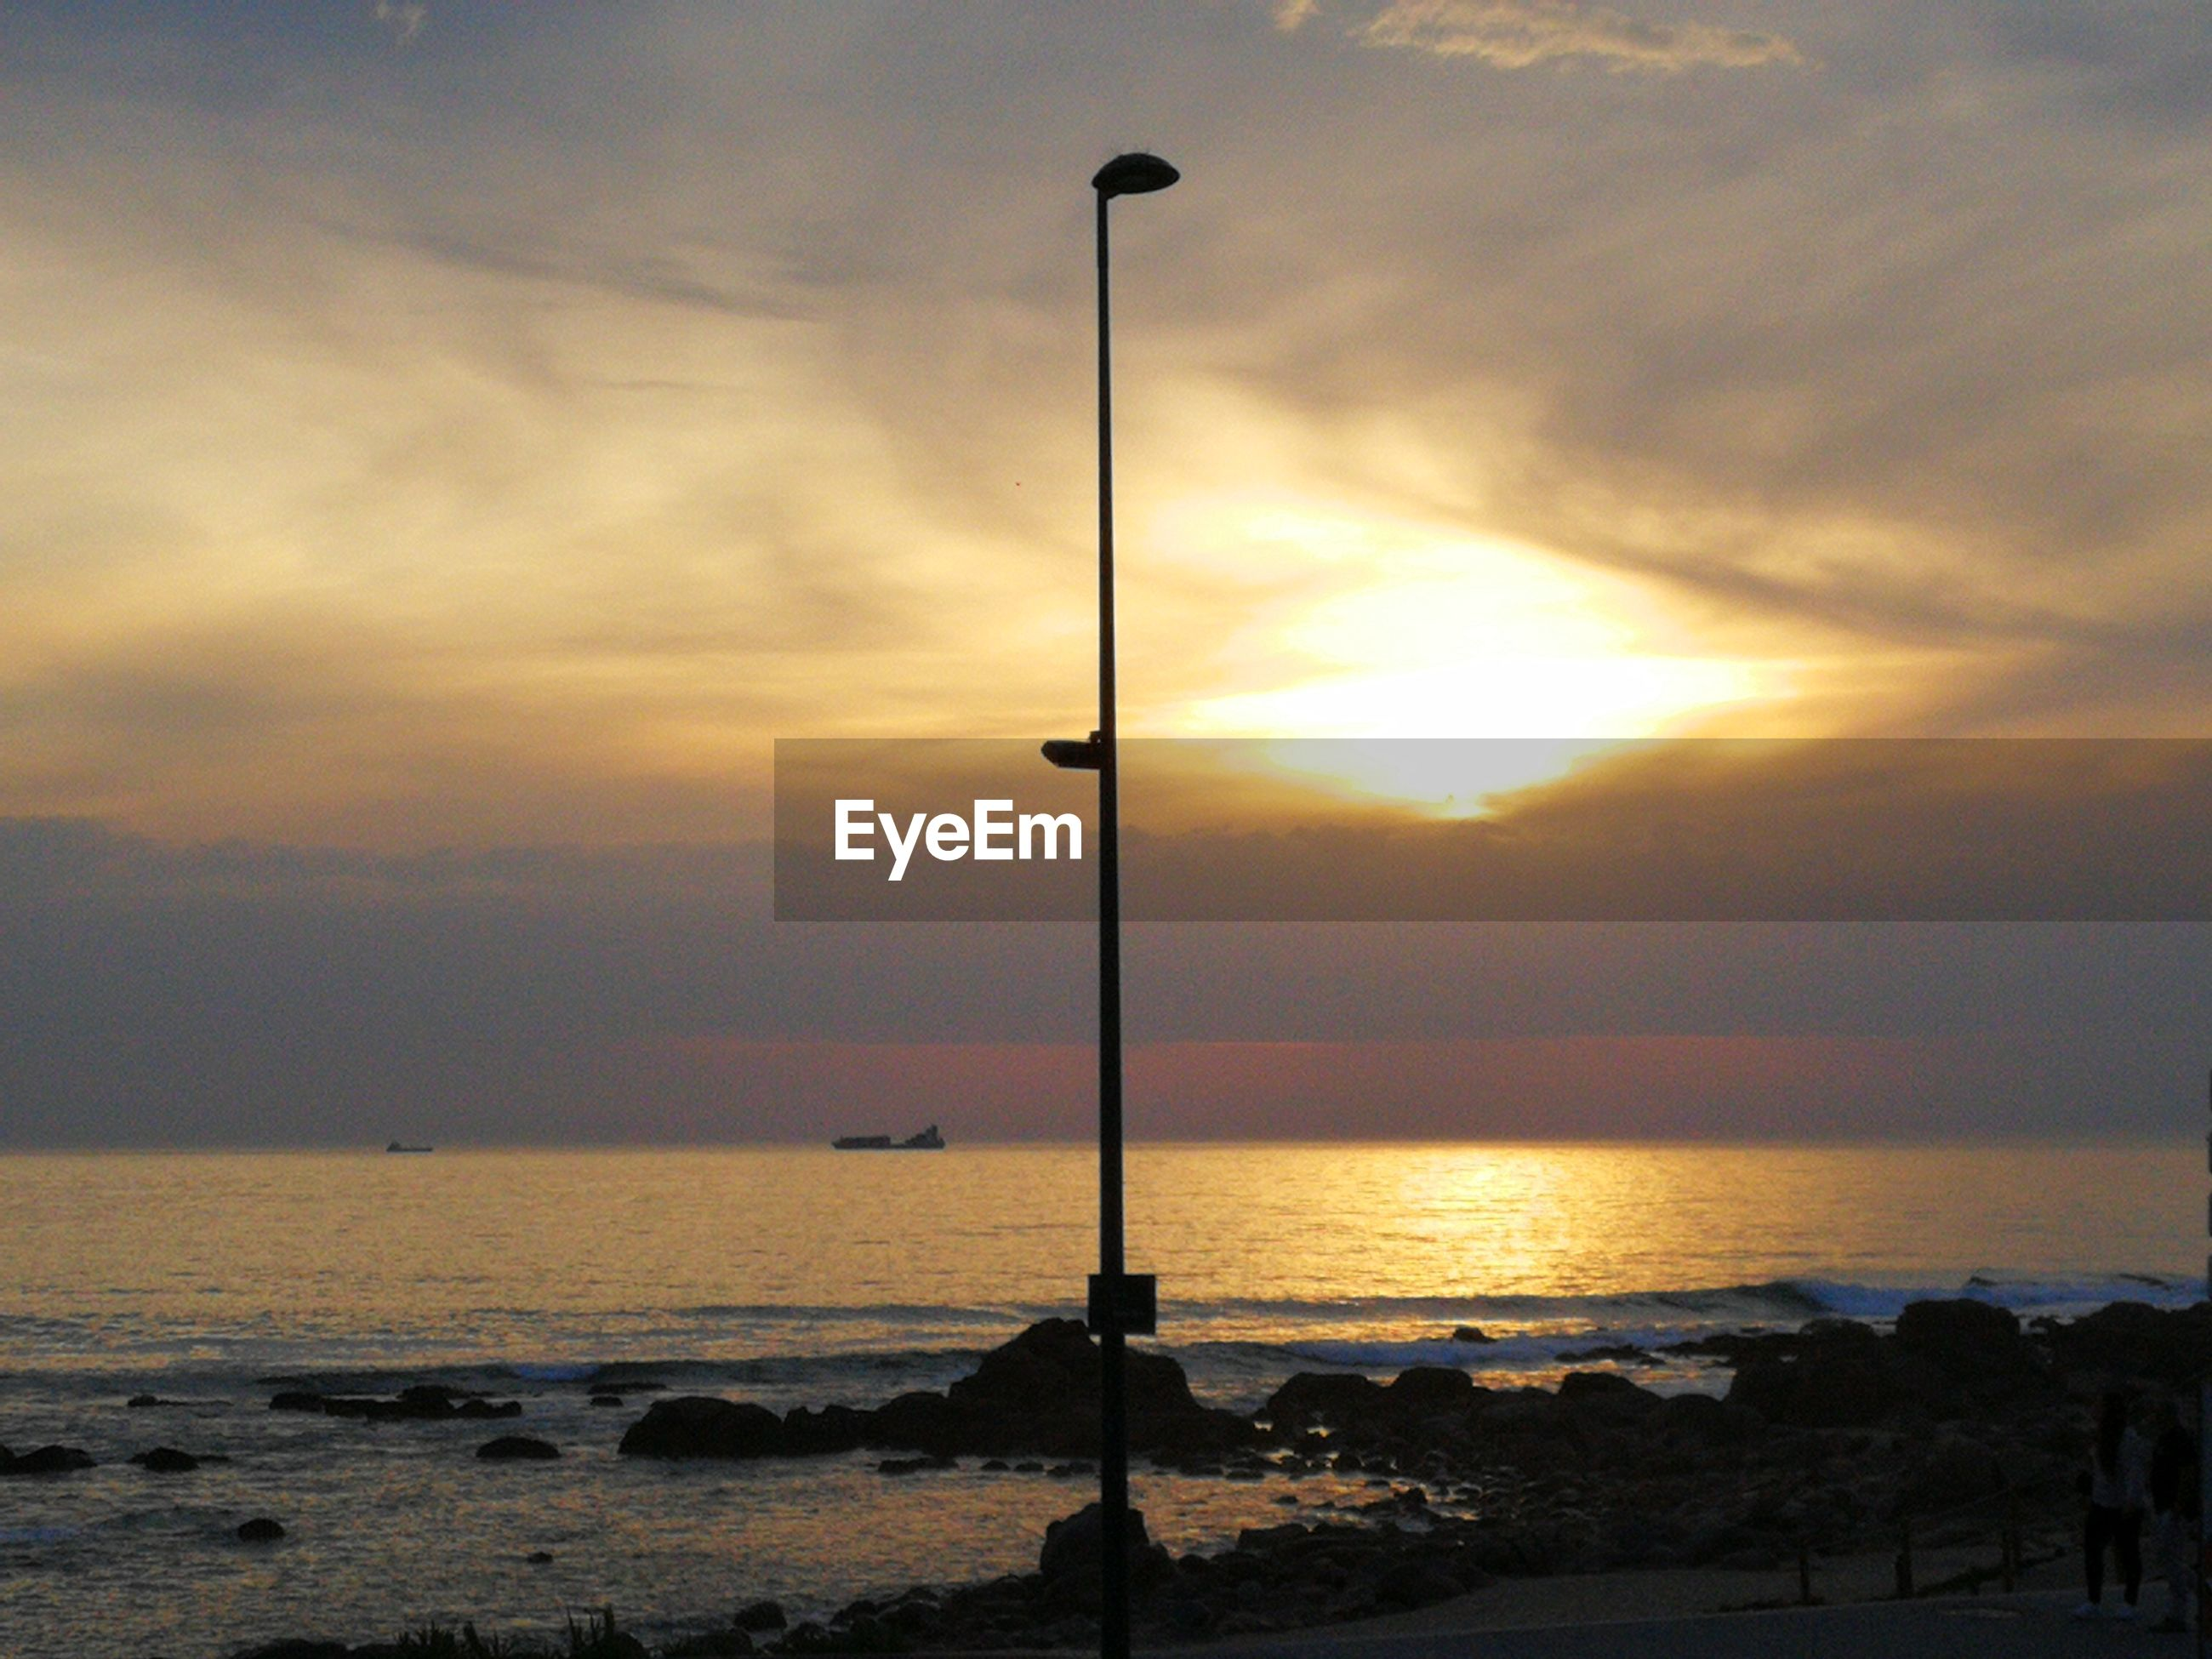 SILHOUETTE STREET LIGHT ON BEACH DURING SUNSET